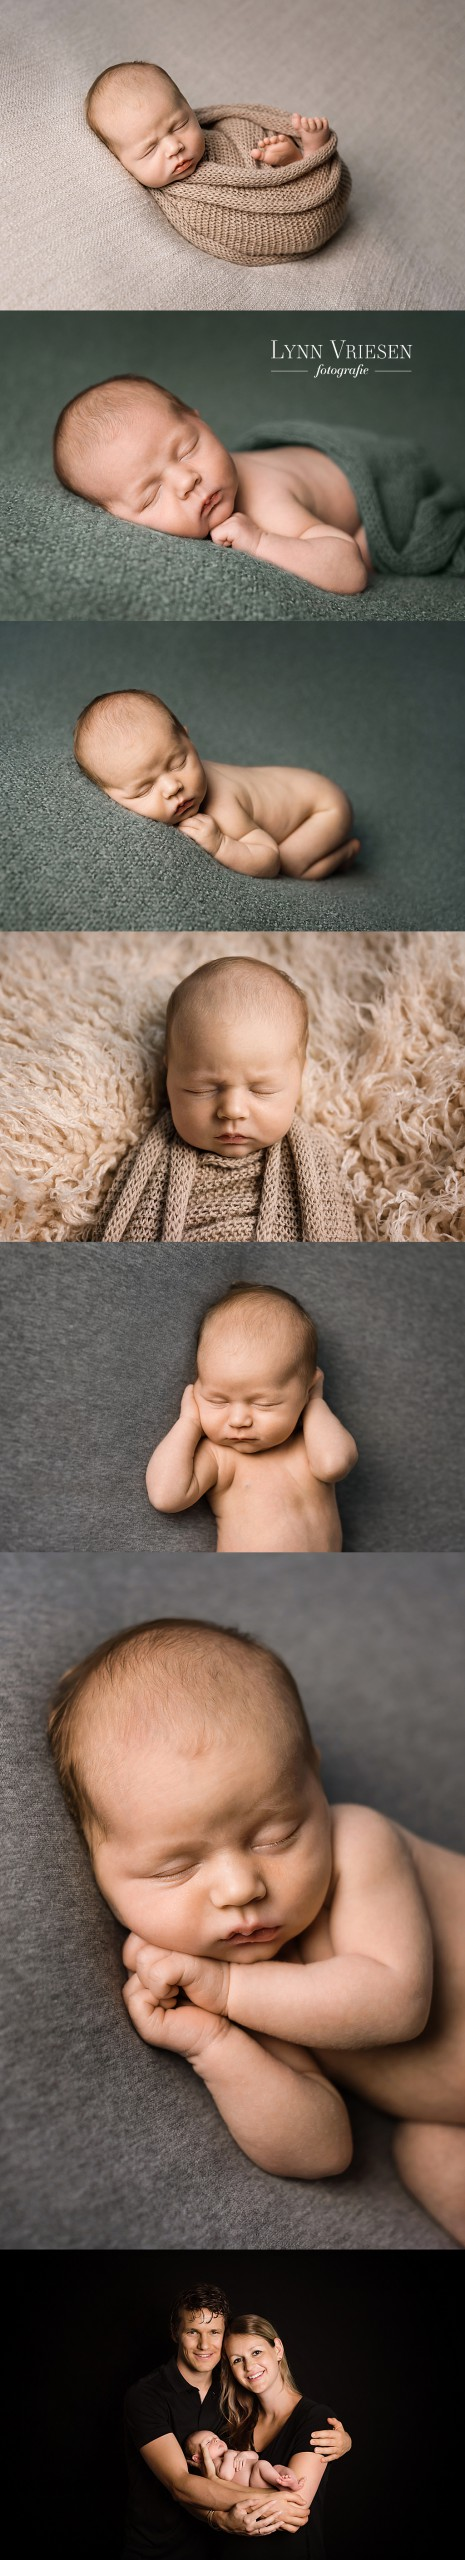 Seth 18 dagen - Newborn fotograaf Lent